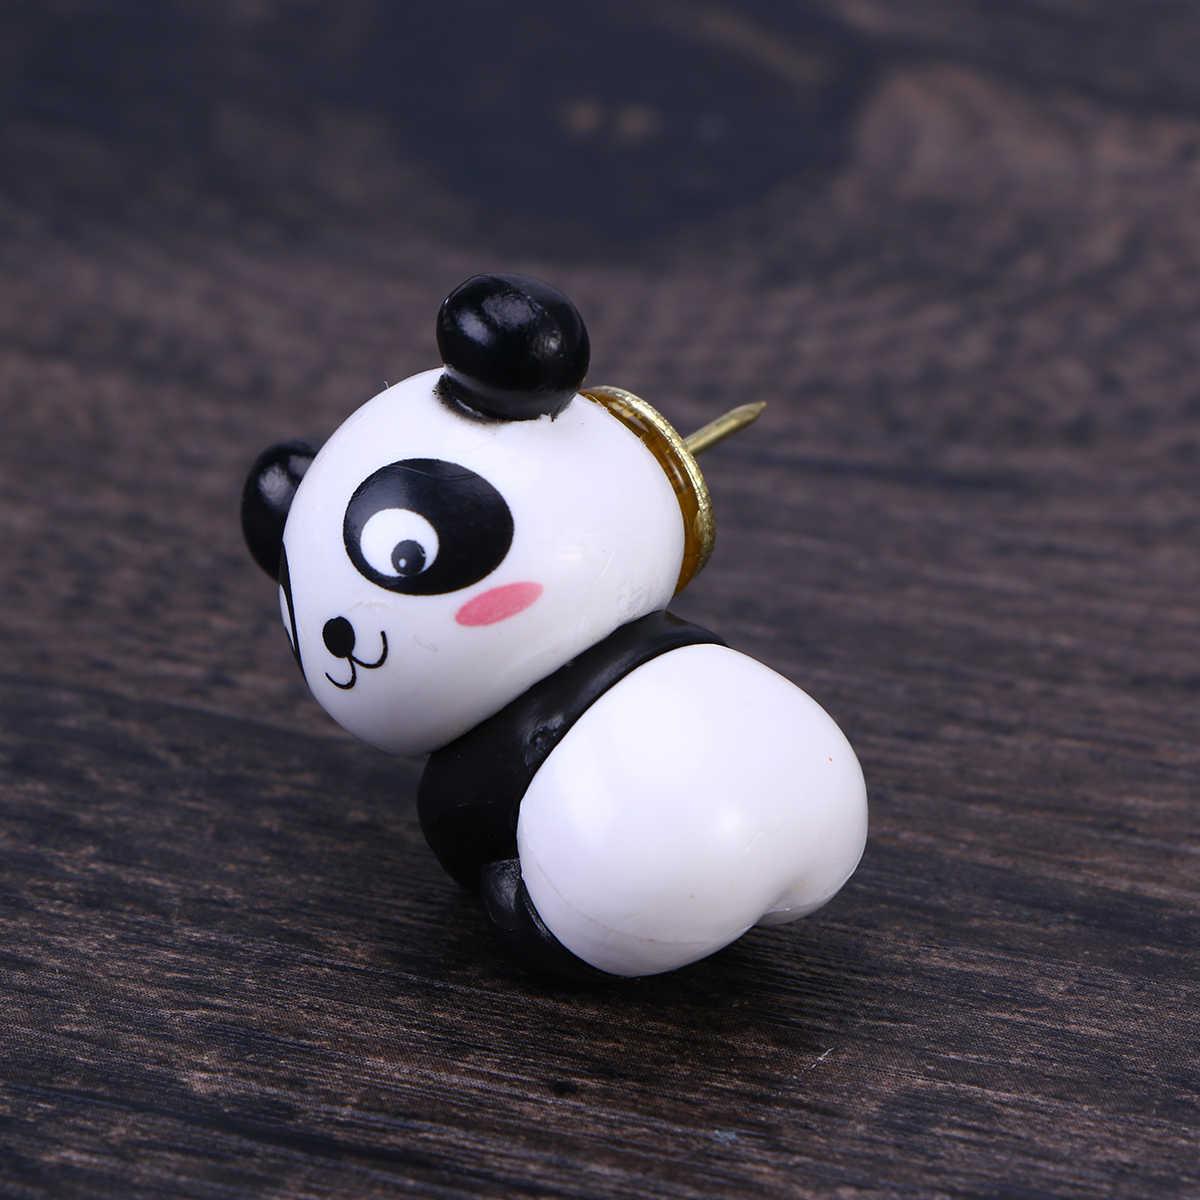 8 Pcs Pin Gambar Indah Panda Menggemaskan Plastik Menggambar Pin Push Pin Paku Payung untuk Tampilan Papan Jalan Kalender